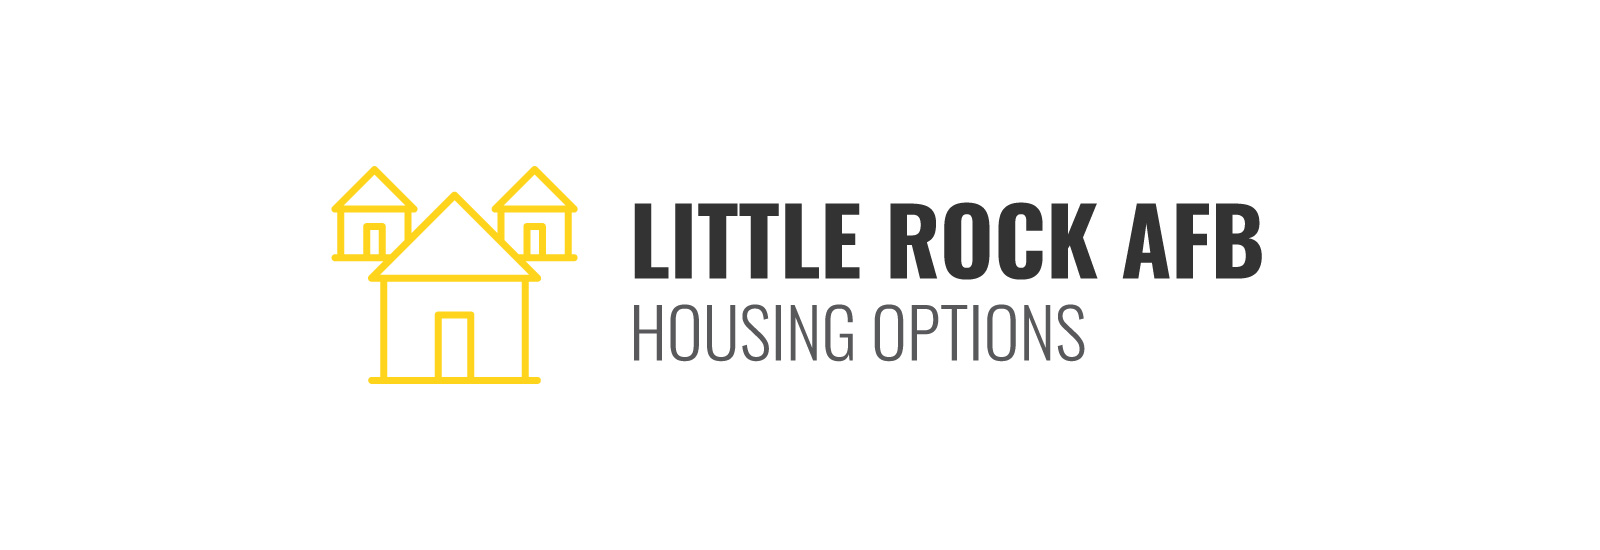 Little Rock AFB Housing Options